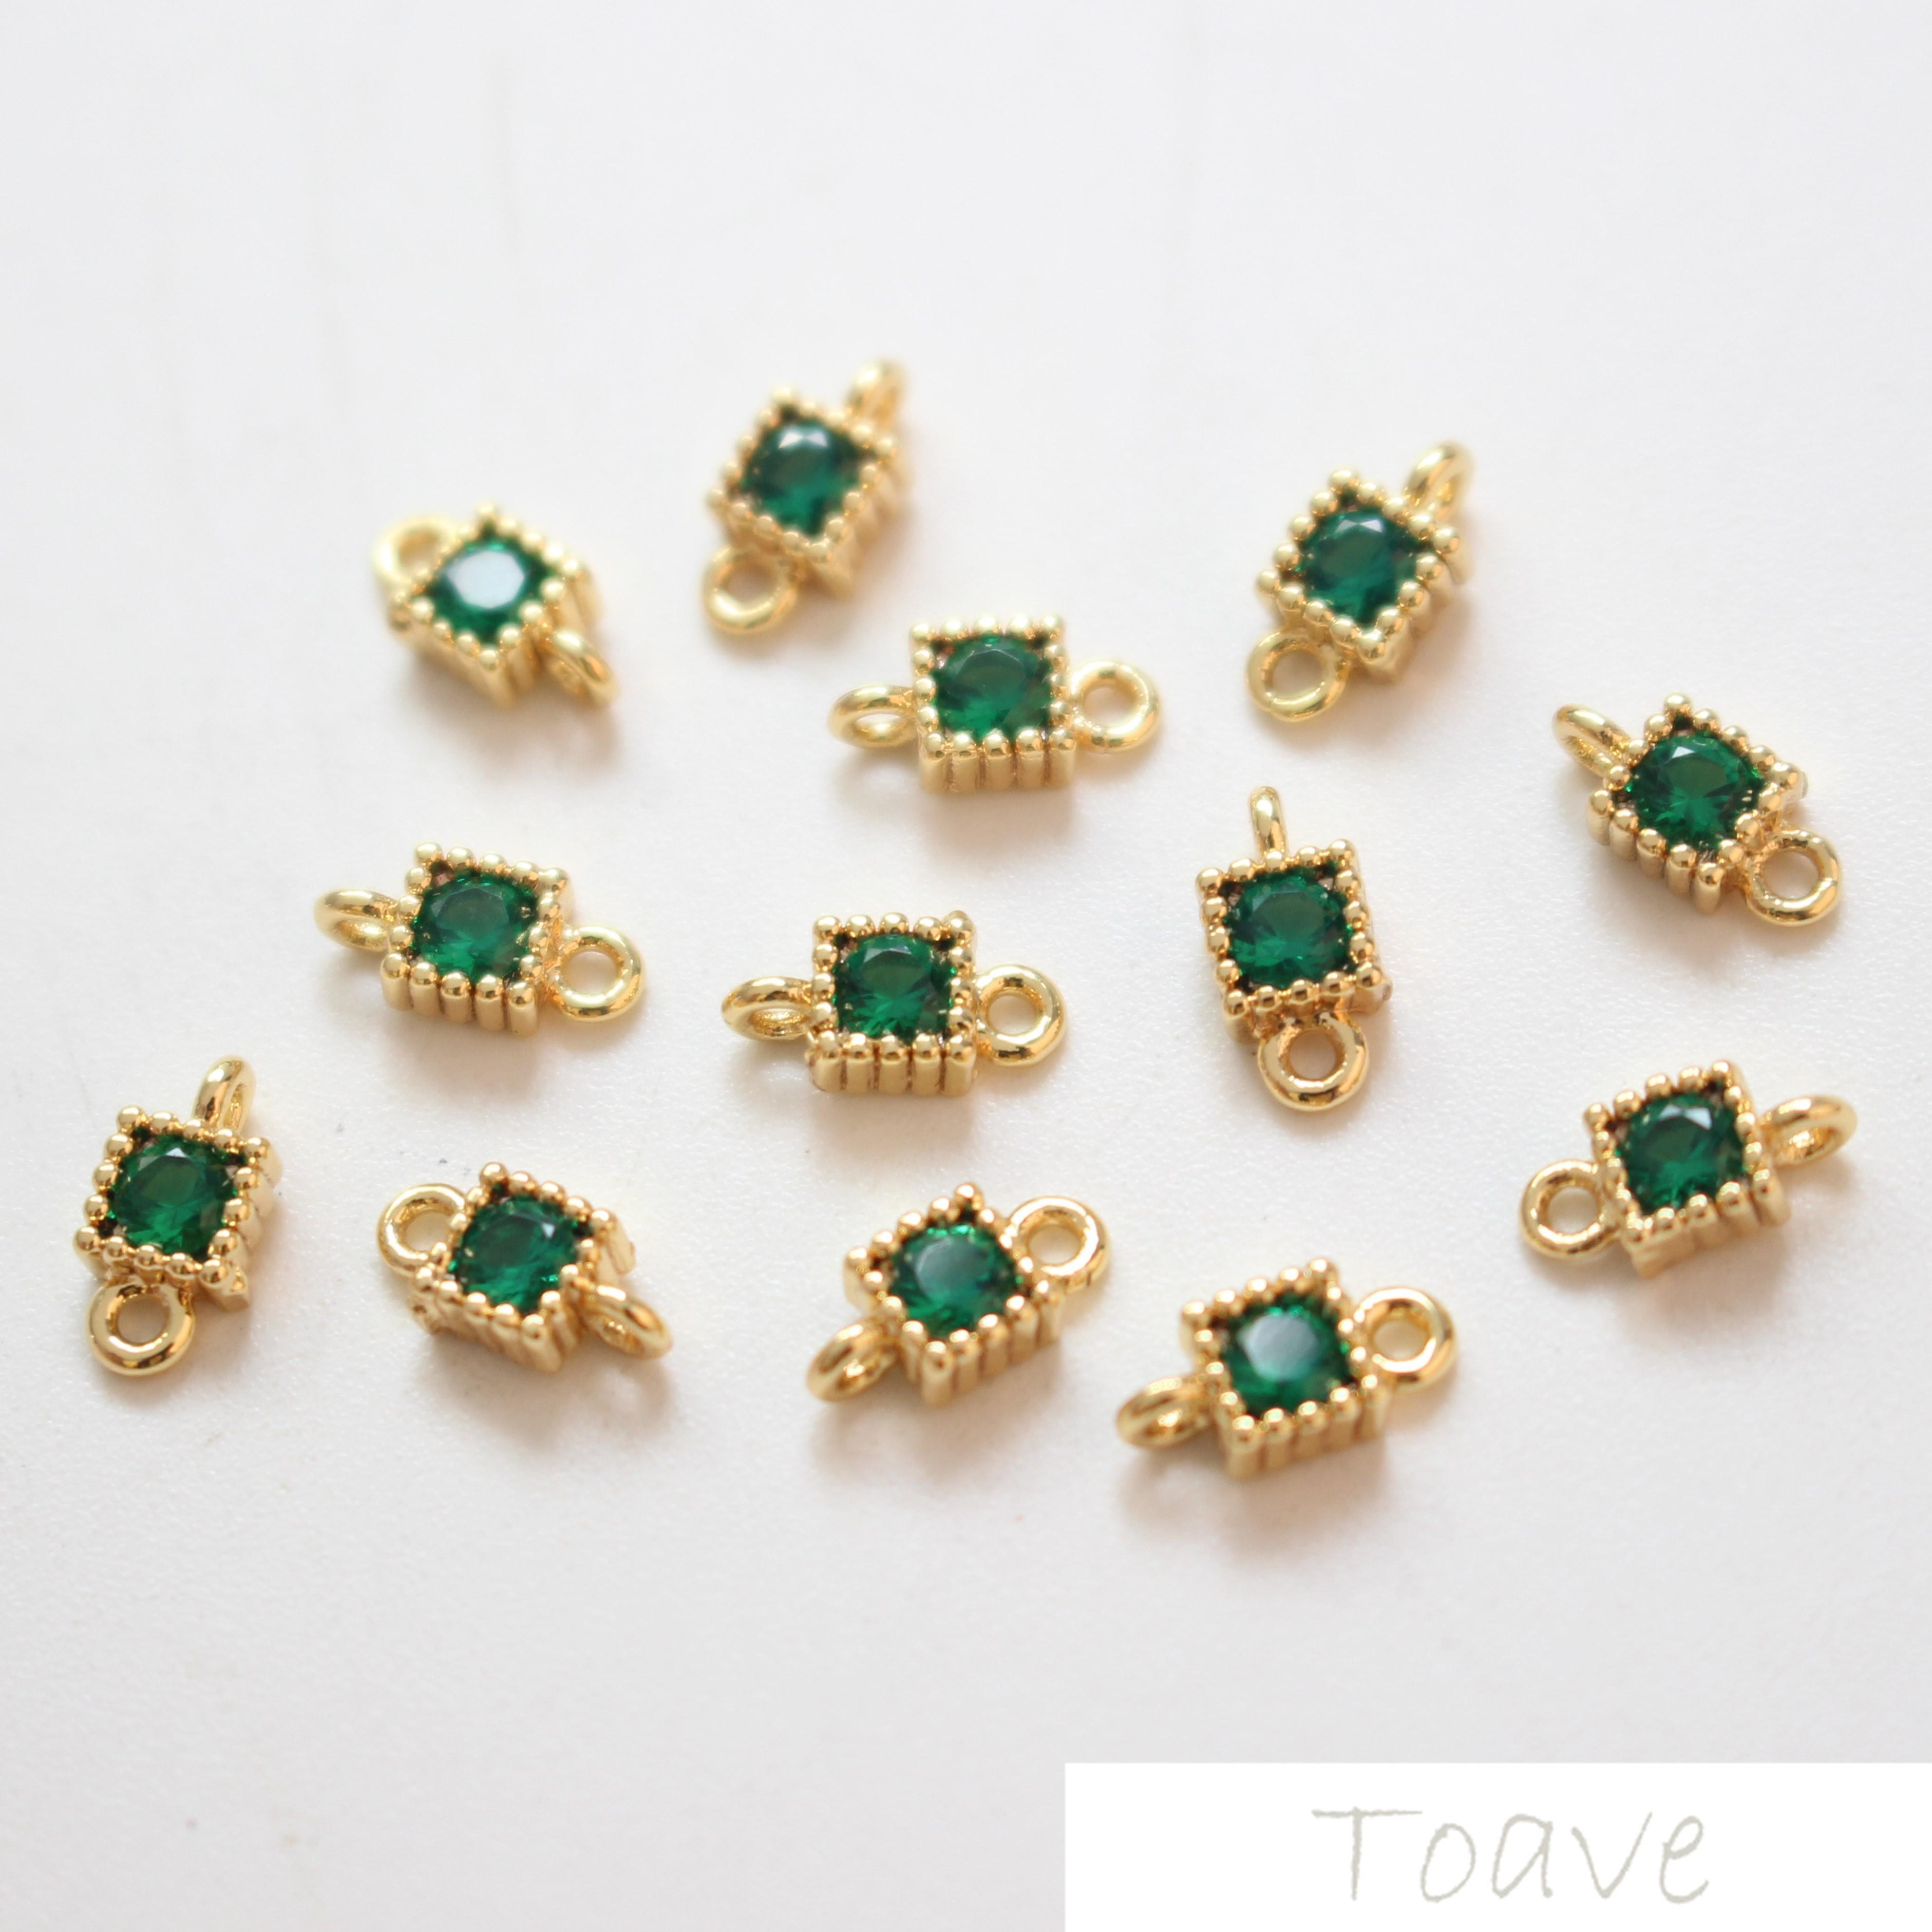 Copper Plating 18K True Gold Square Zirconium Double Hanging Drill Diy Ear Decoration Bracelet Necklace Material Accessories